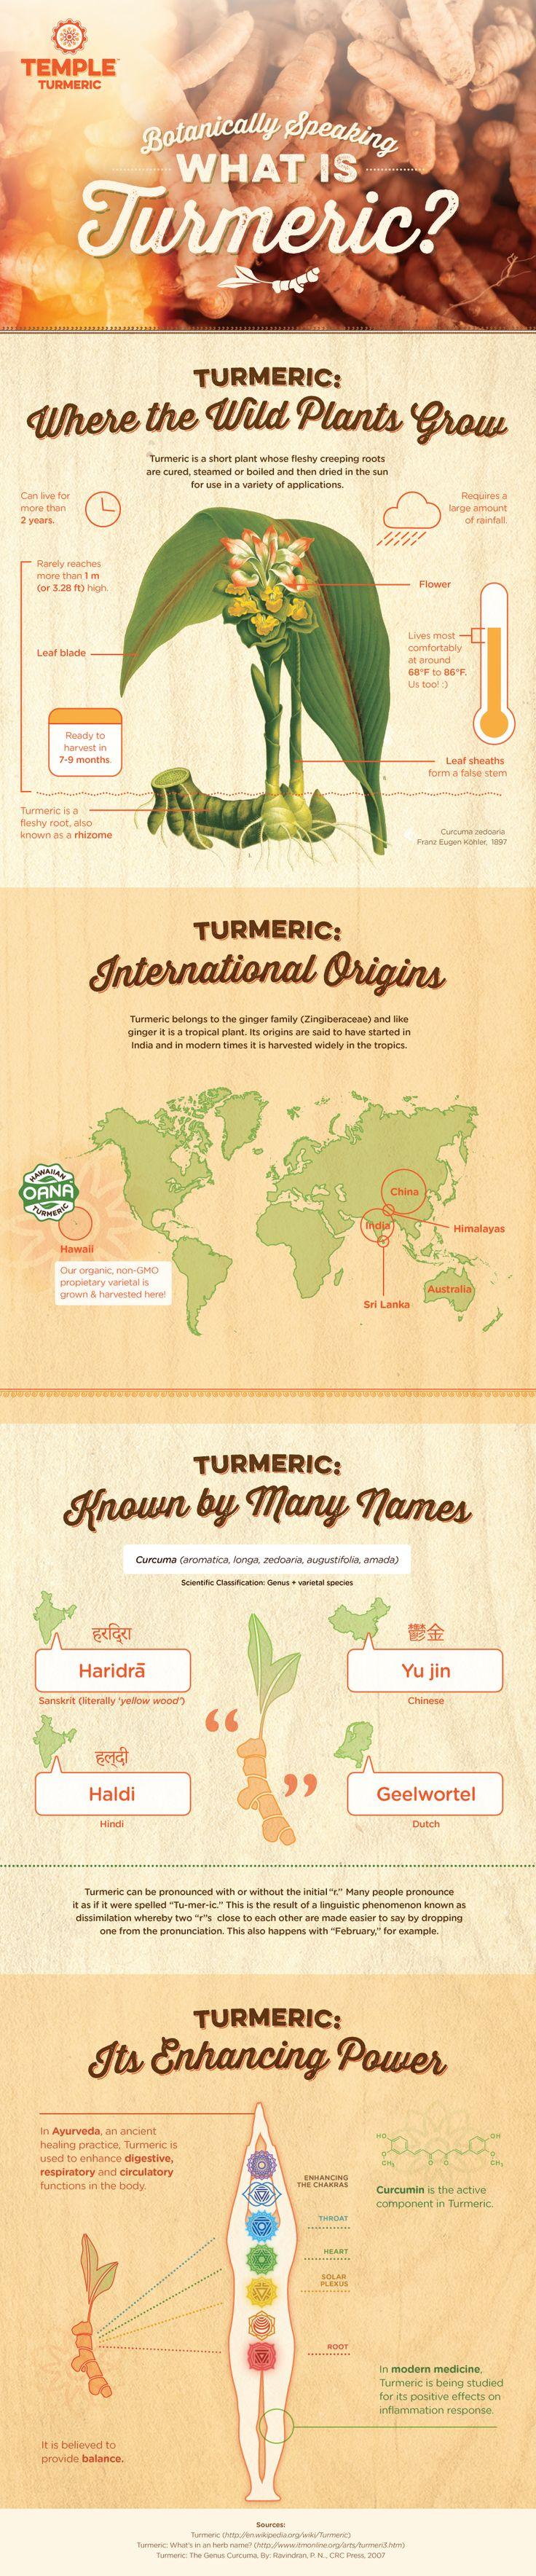 Botanically Speaking - What is Turmeric?    Temple Turmeric